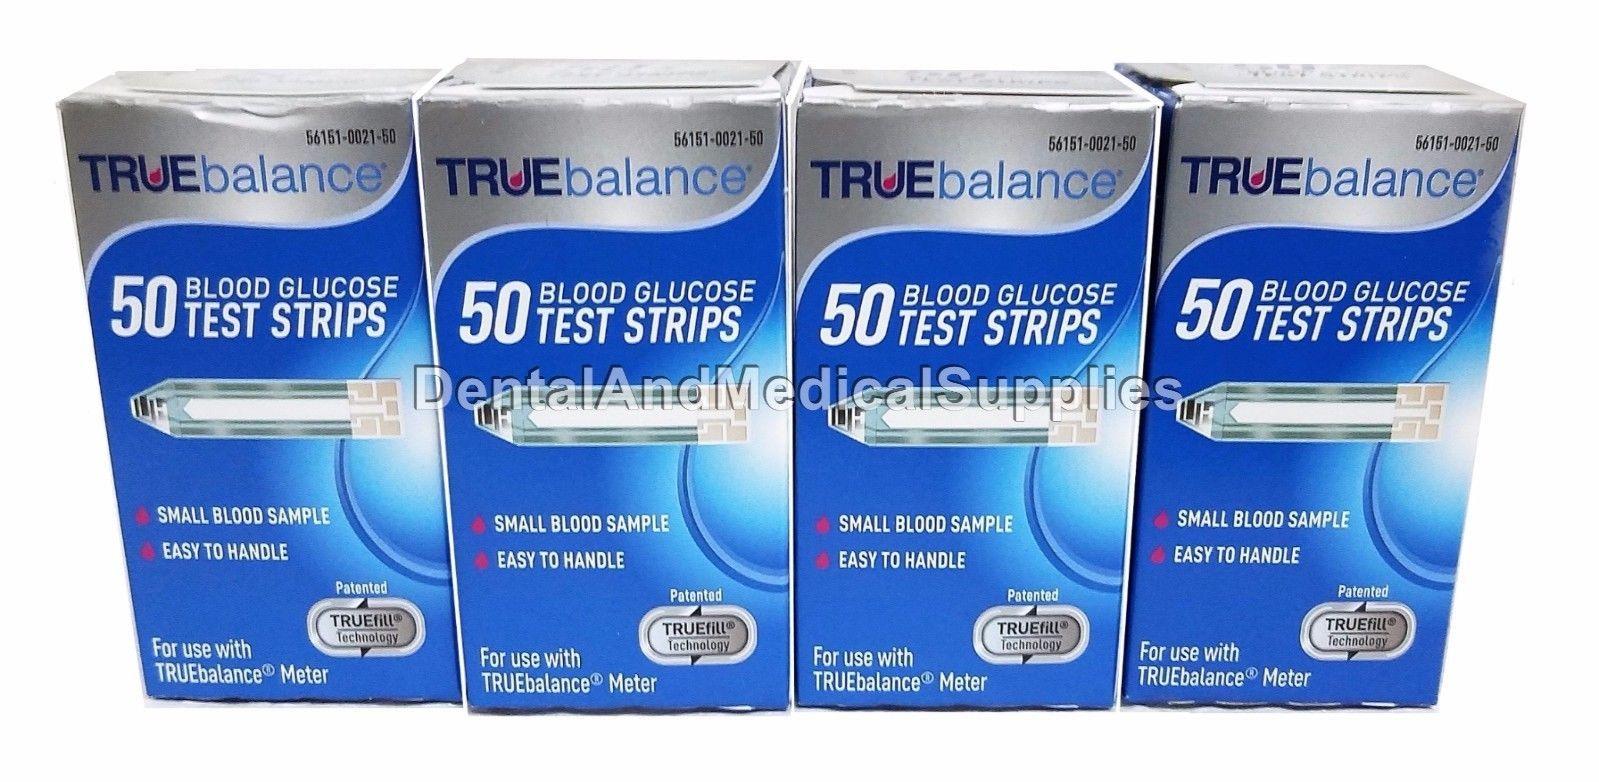 200 TRUE Balance Diabetic Test Strips 4 x and similar items